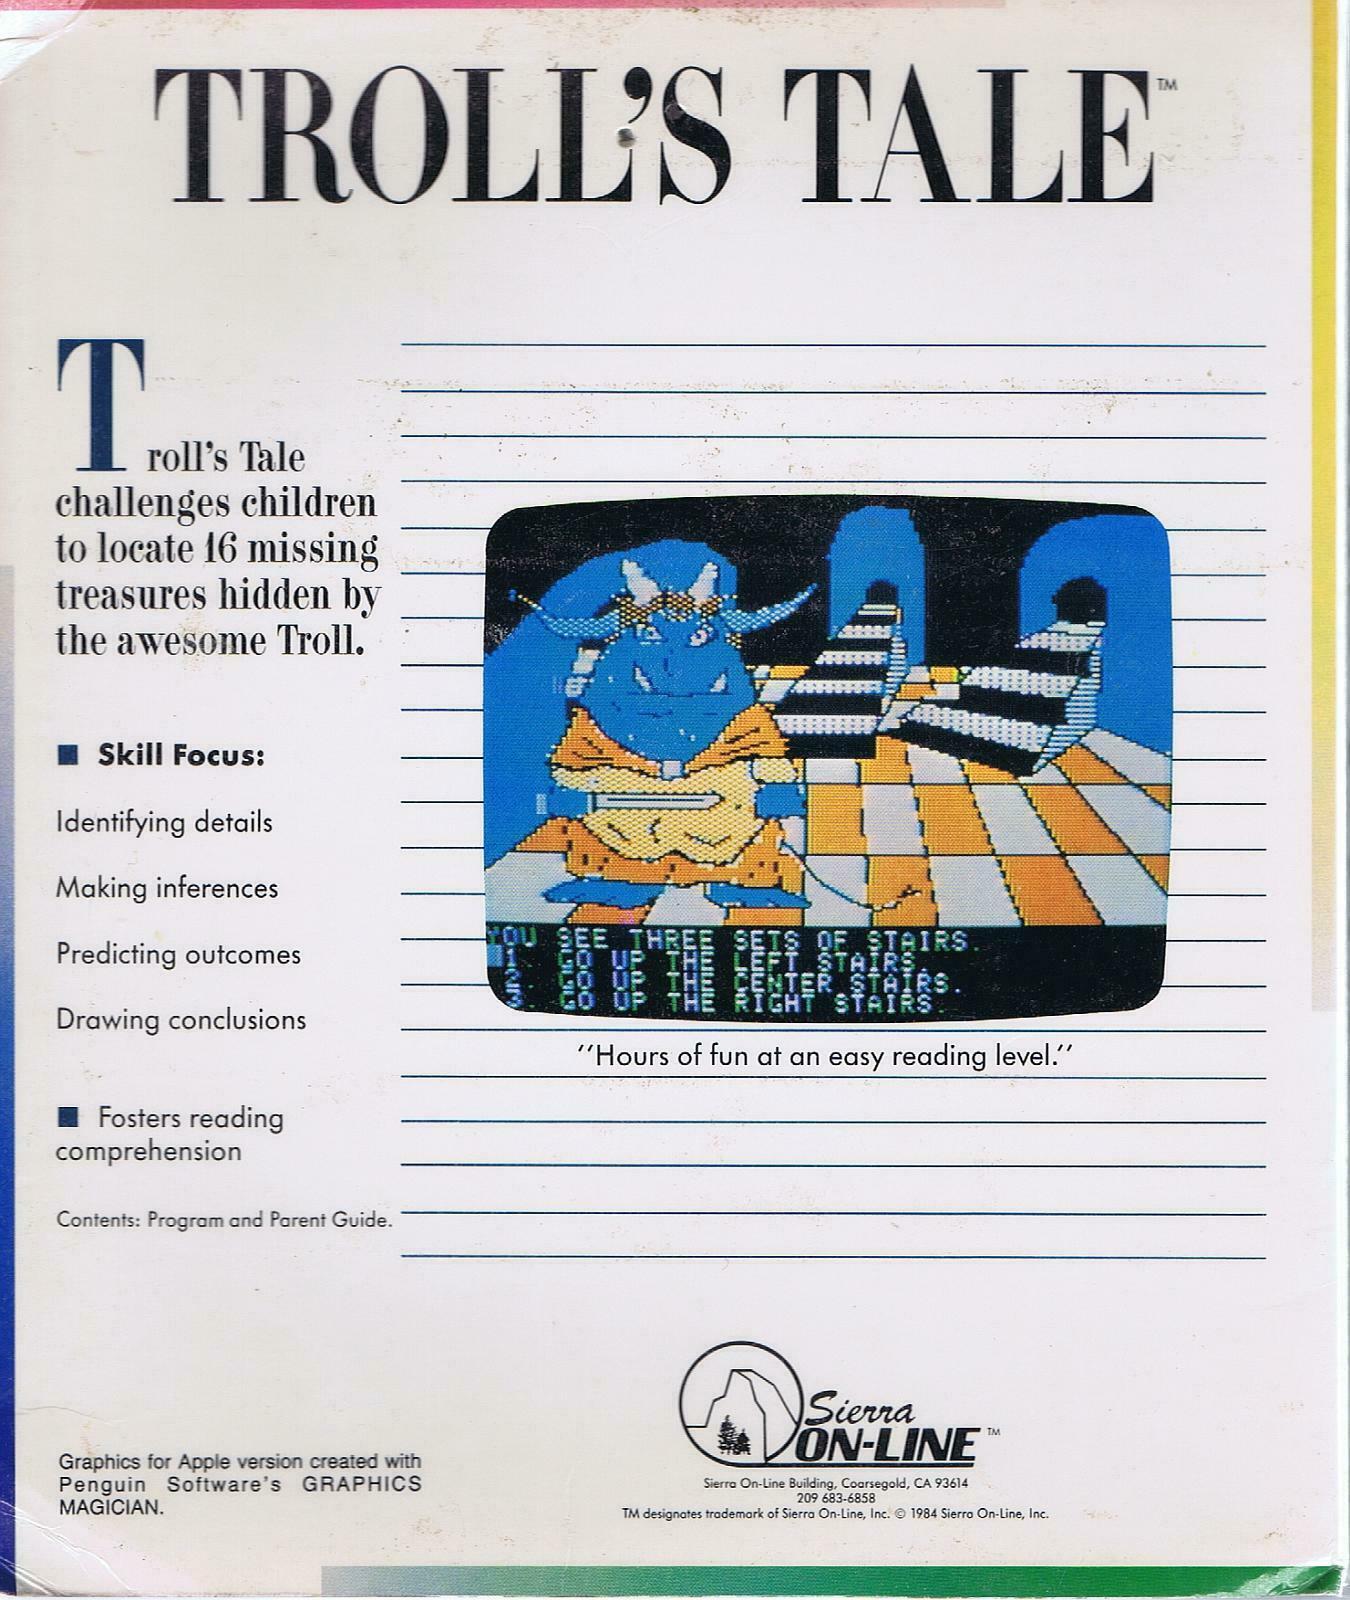 appleII-Troll's Tale-03